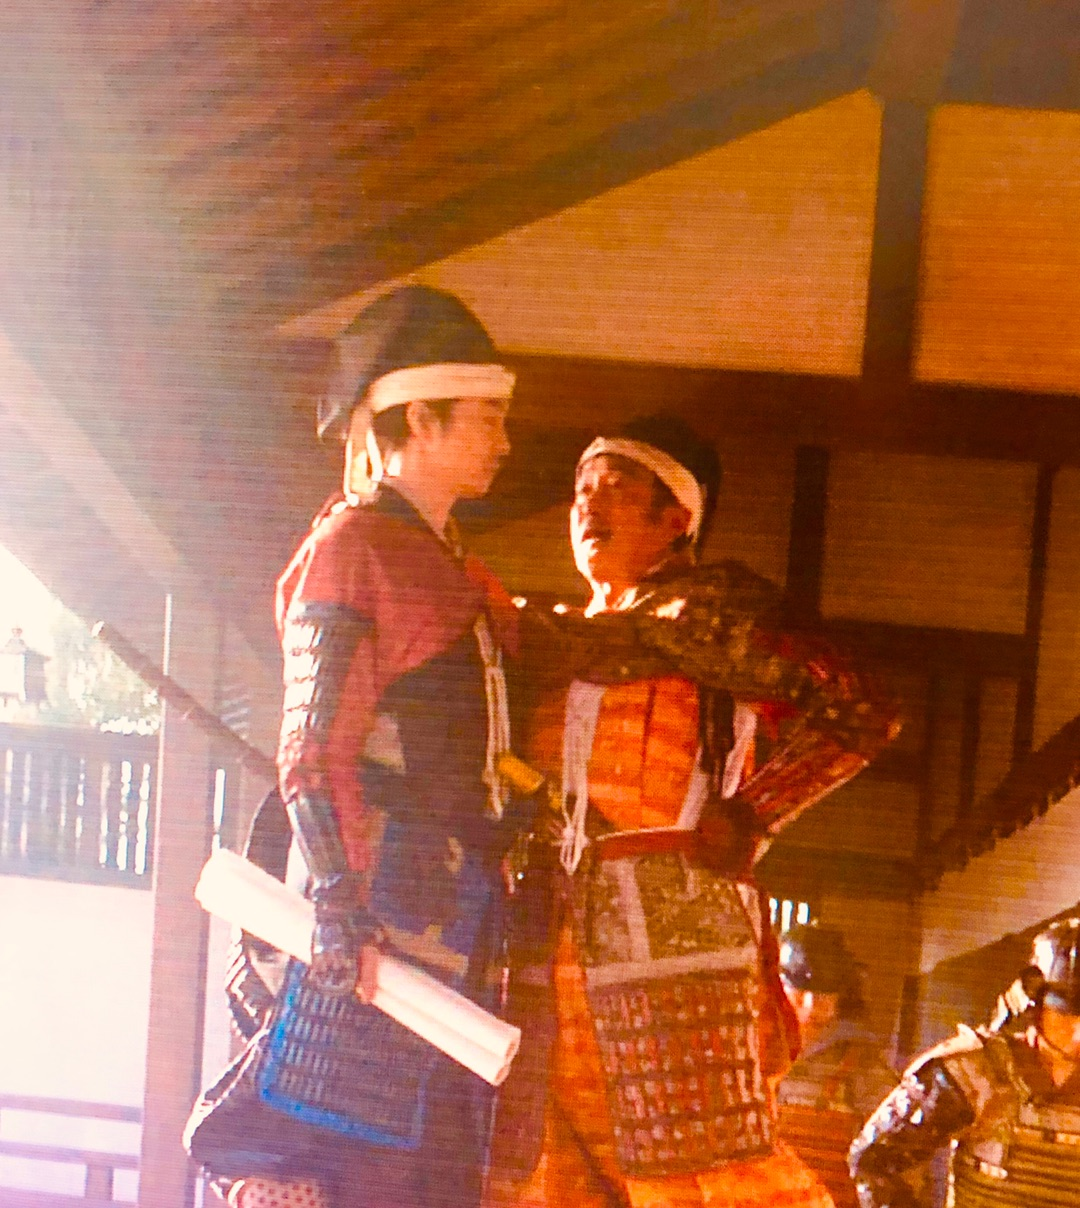 Once upon a time by Bonze大河ドラマ『麒麟がくる』にでた「九十九髪茄子の茶入」NHK大河ドラマ『麒麟がくる』第28回「新しき幕府」のワンシーン